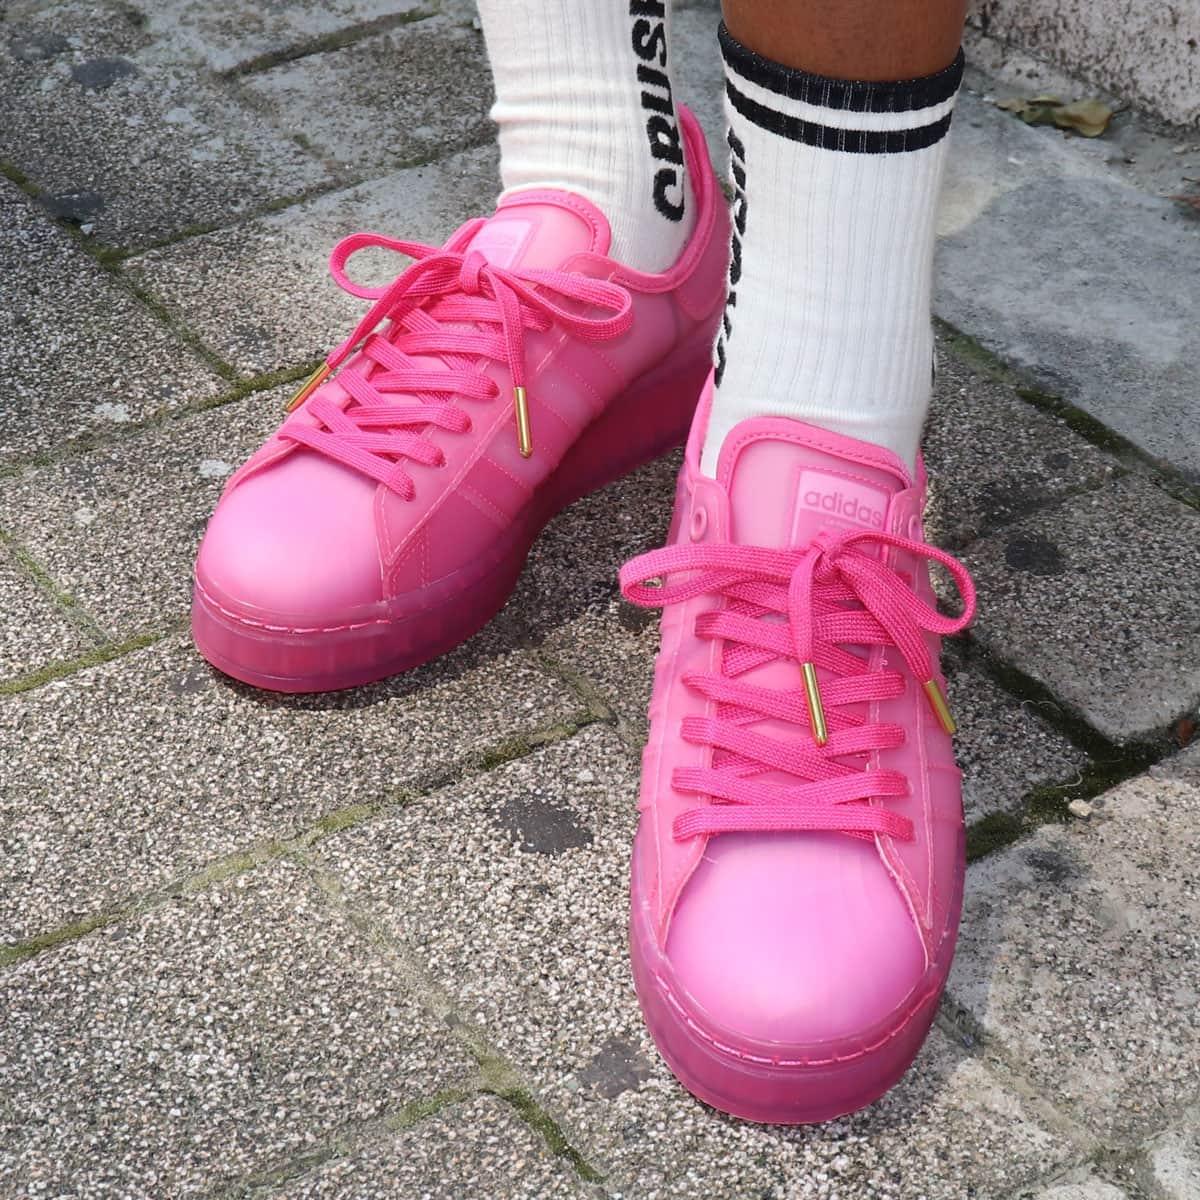 adidas SUPERSTAR JELLY W SEMI SOLAR PINK/SEMI SOLAR PINK/FOOTWEAR WHITE 20SS-S_photo_large